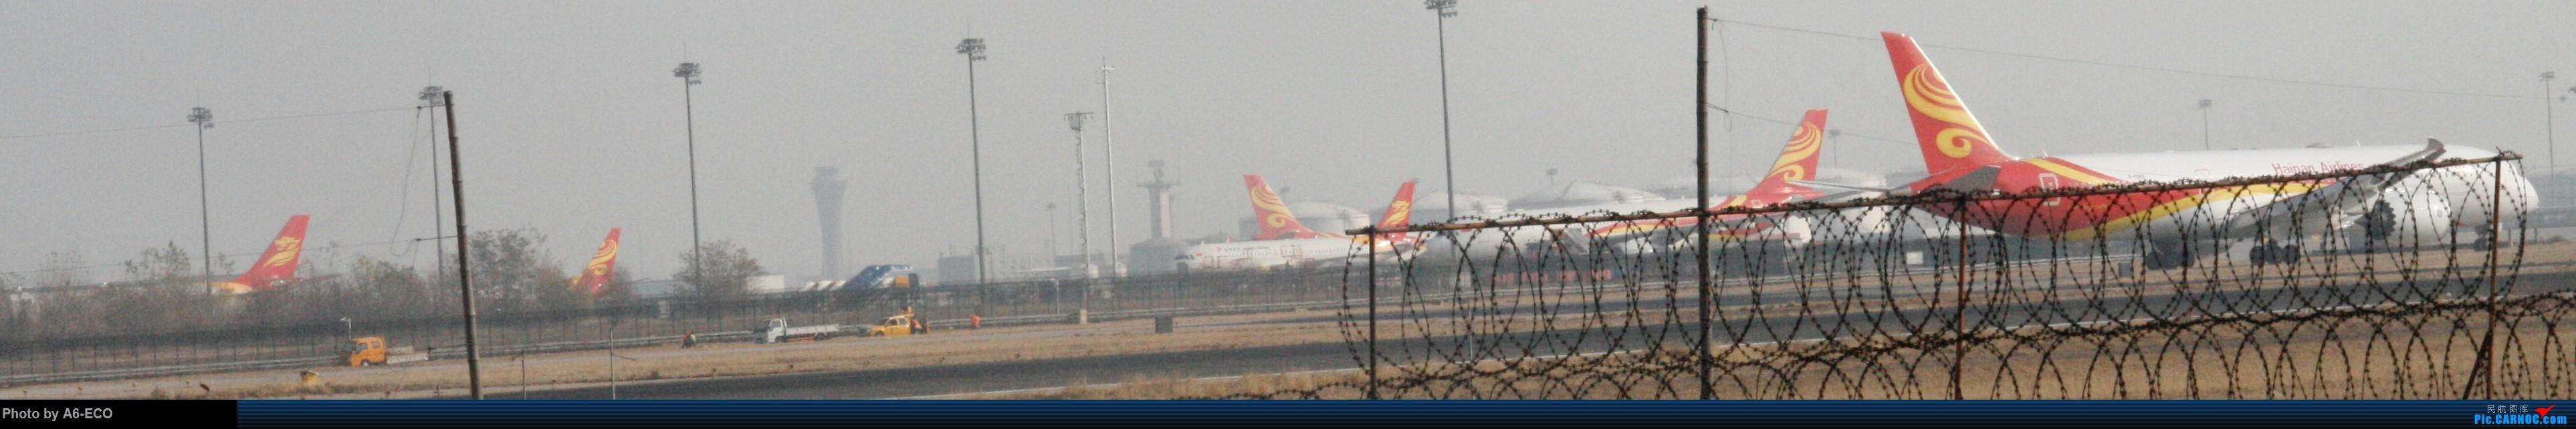 Re:[原创]今天运气极好,云南孔雀,B-1070,2个菜航邮戳,泡菜航彩绘,东航邮戳......    中国北京首都国际机场